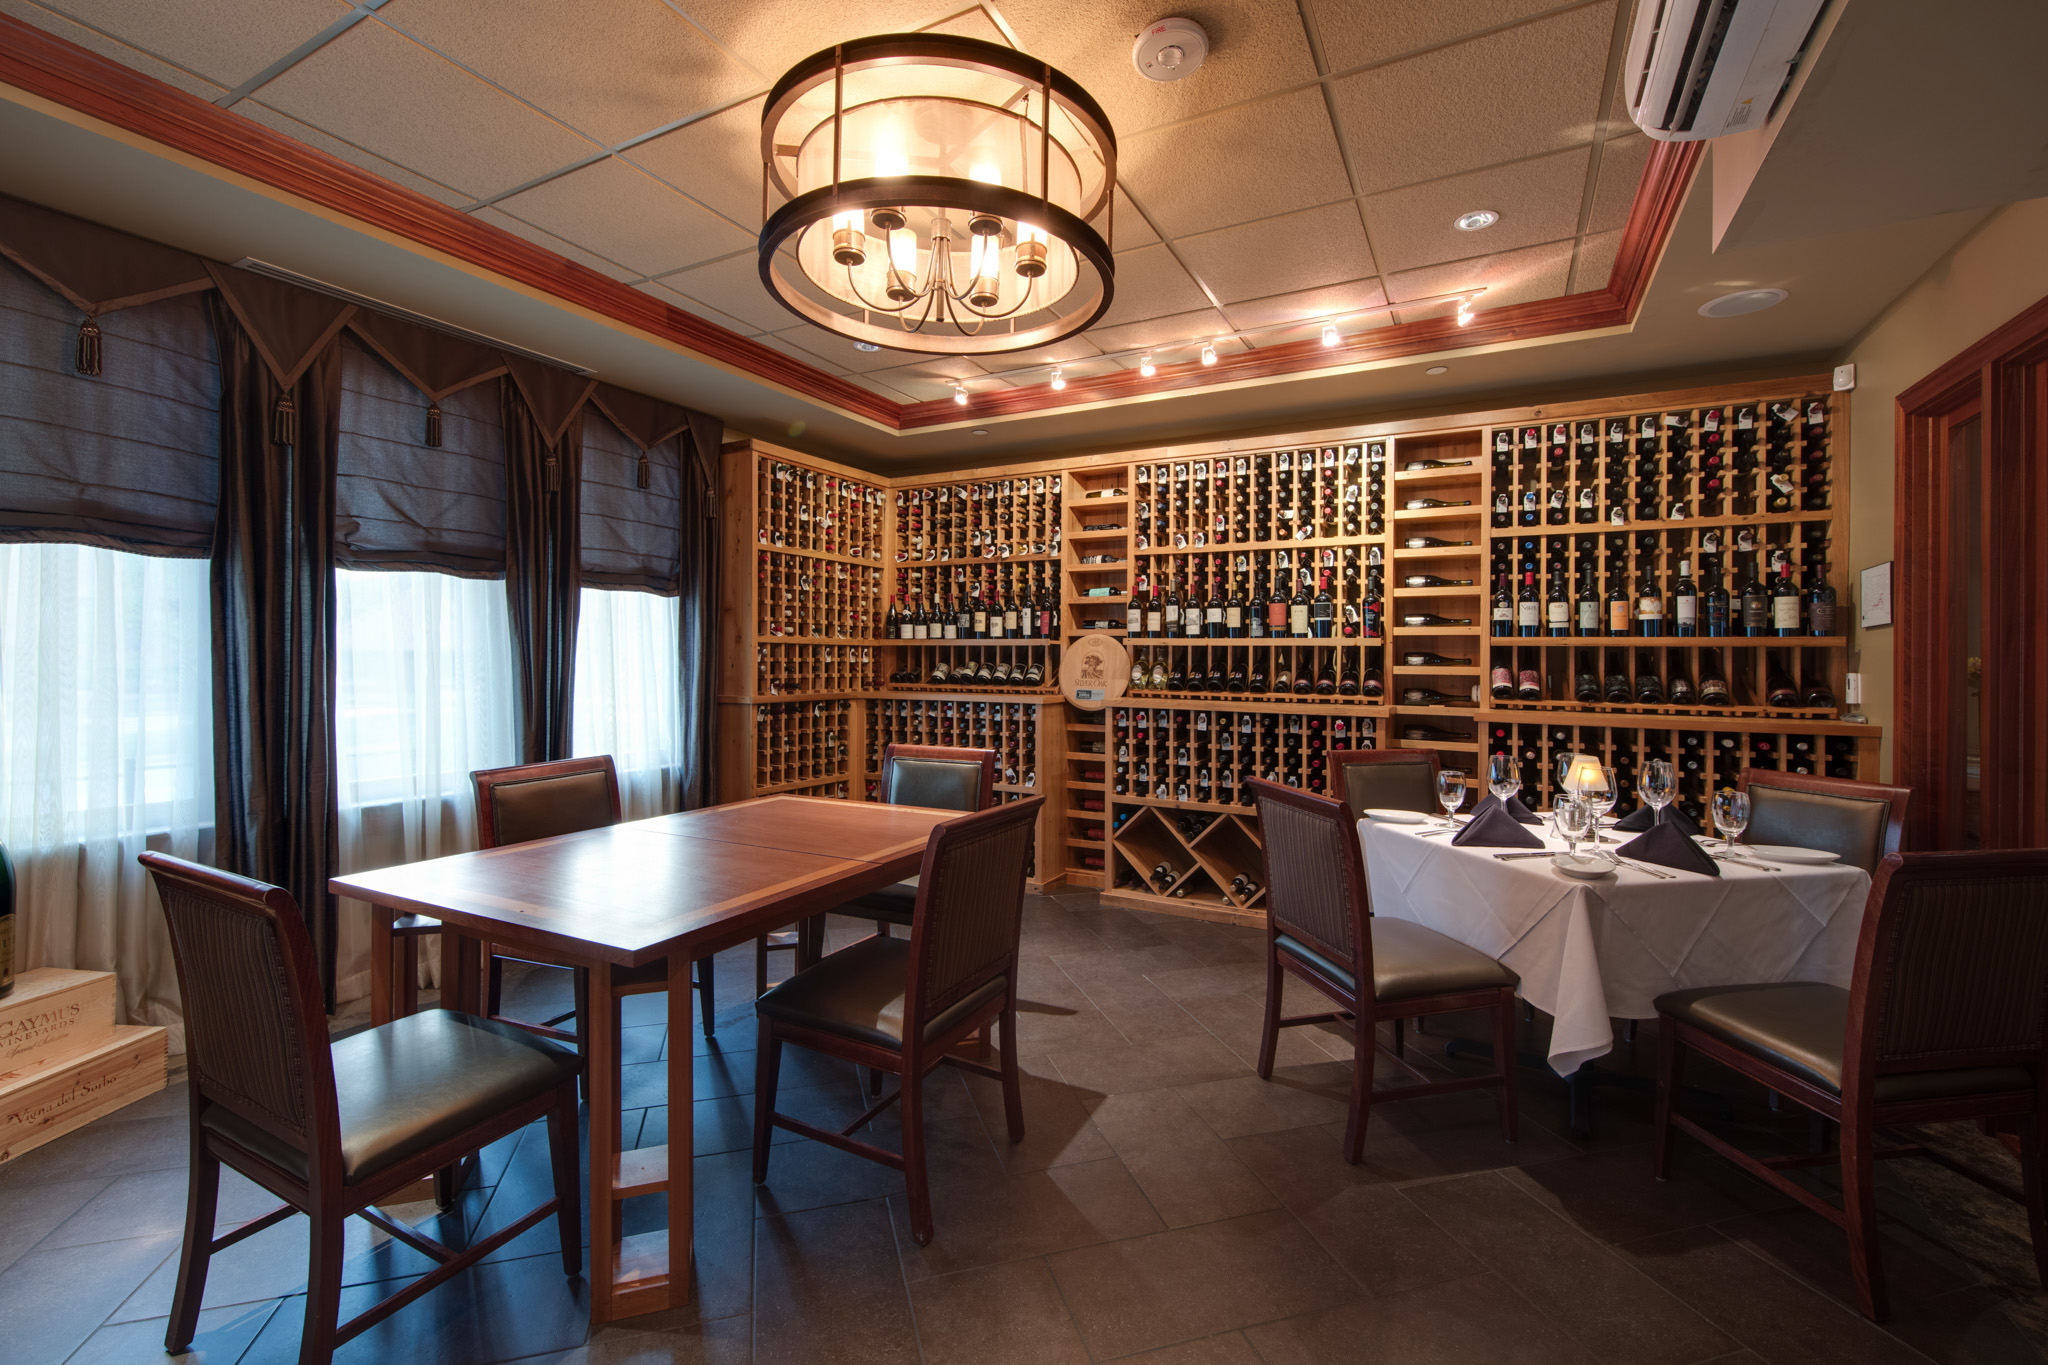 Ruth's Chris Steak House - Wine cellar